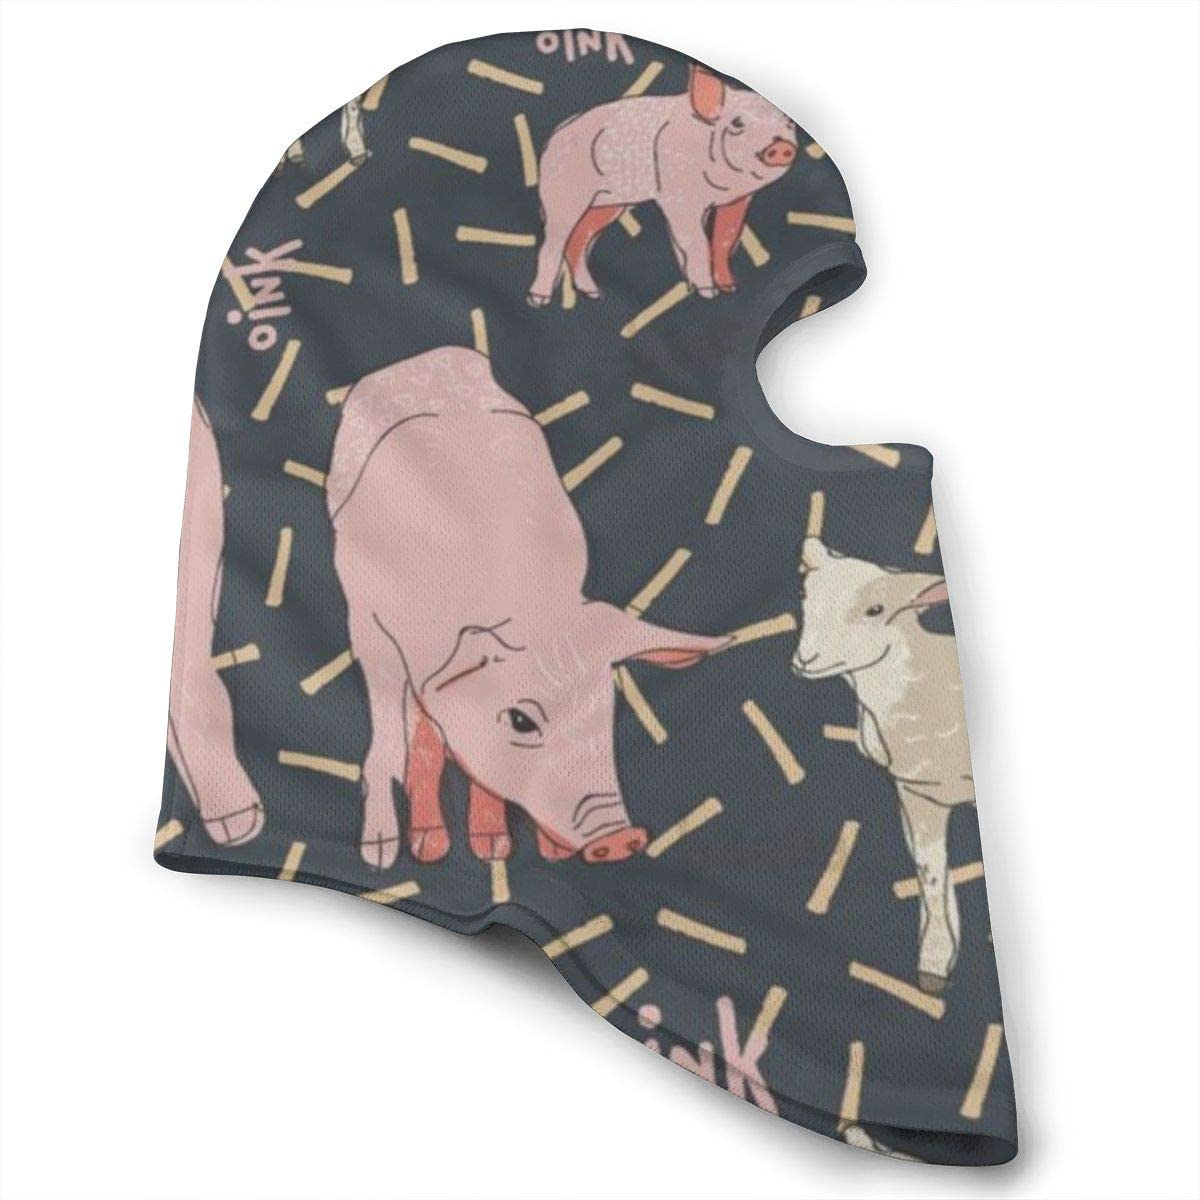 CAClifestyle Sheep and Pig Unisex Windproof Balaclavas Full Face Mask Hood